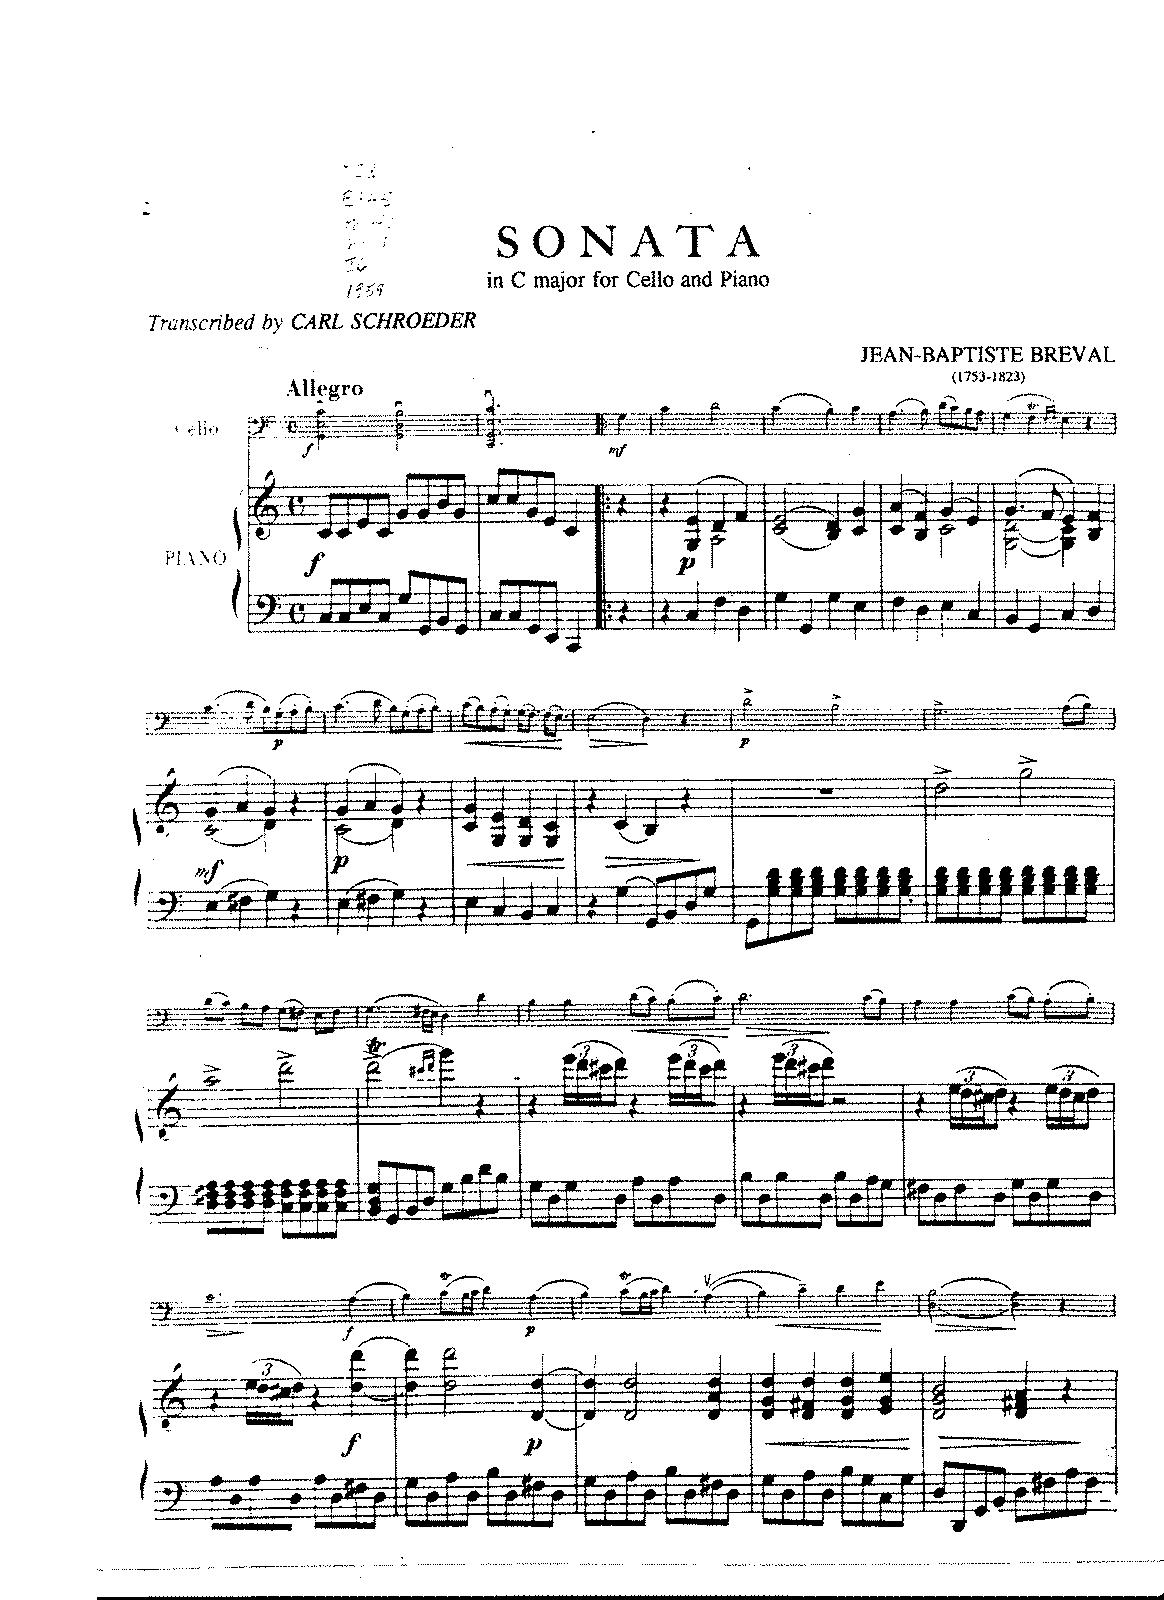 All Categories Awarelost Mark Tremonti Prs Wiring Diagram Breval Cello Sonata In C Major Pdf